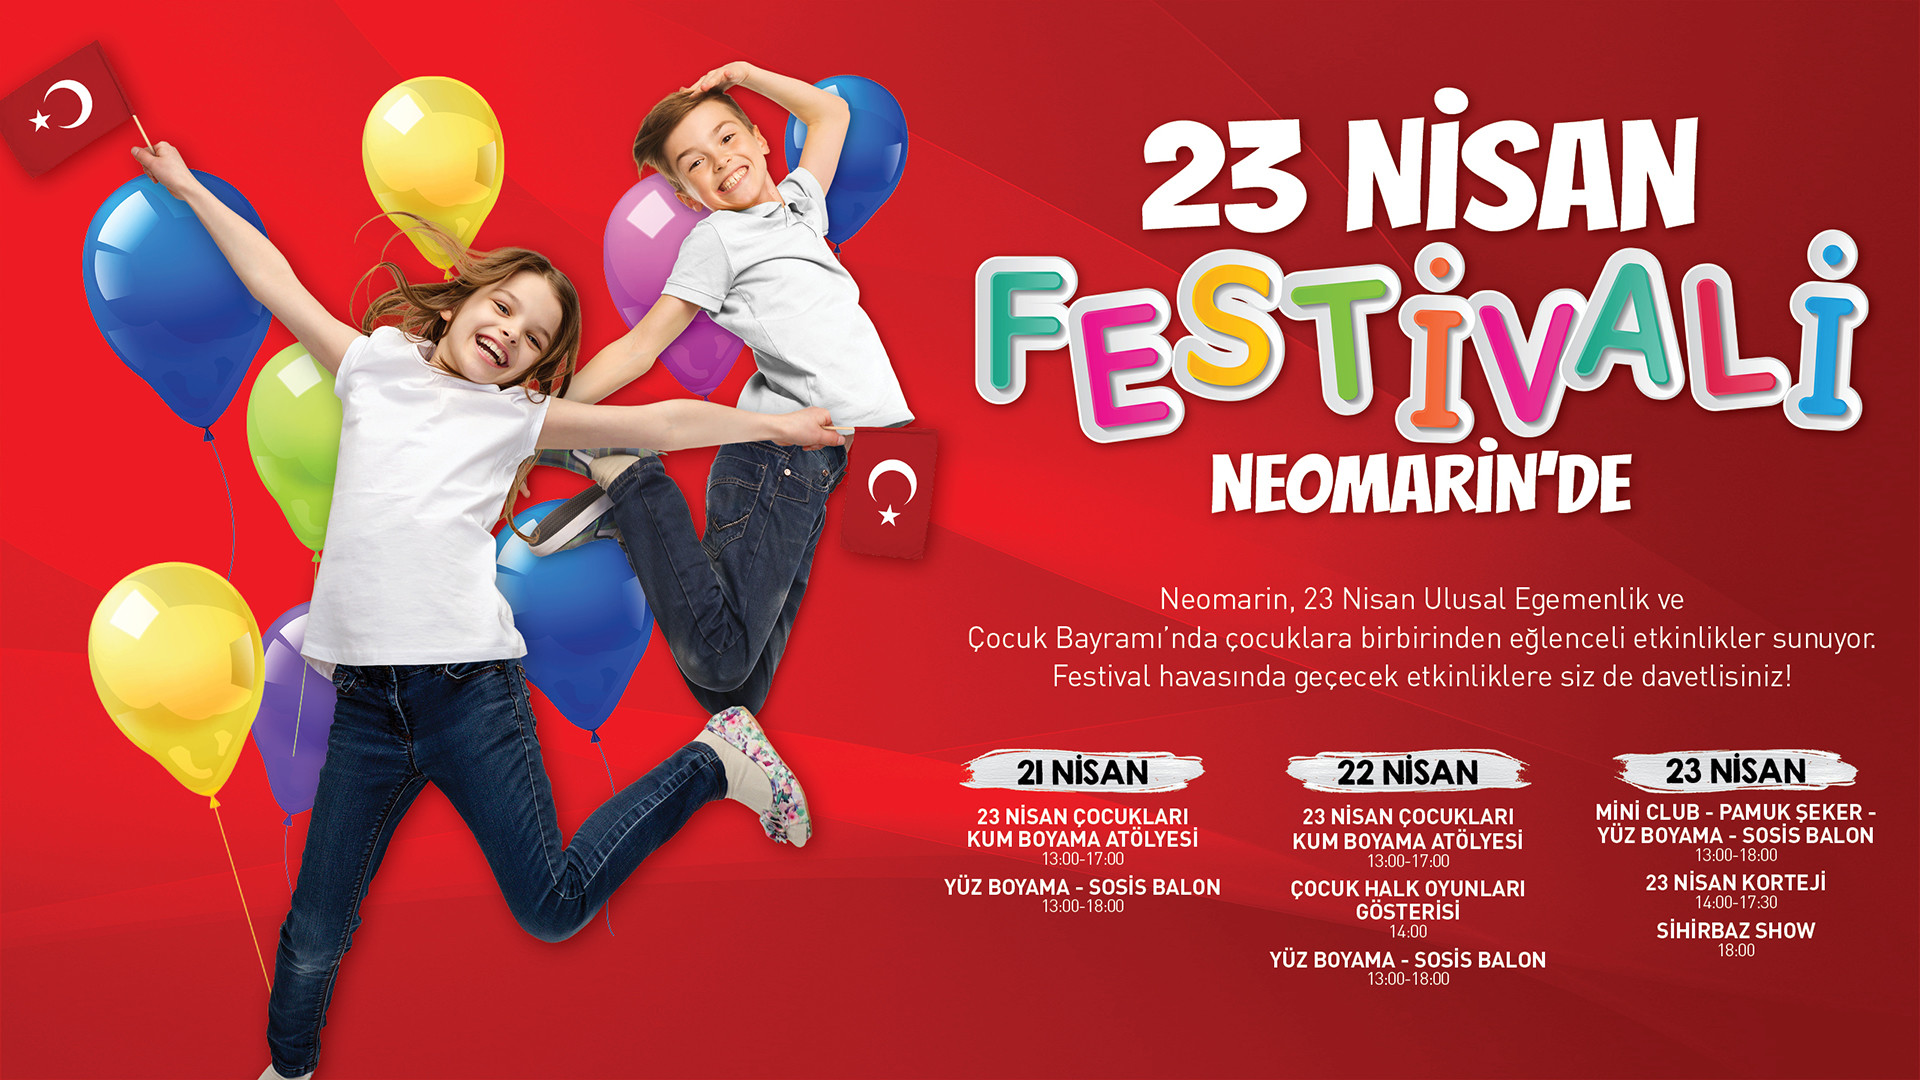 23 Nisan Festivali Neomarin'de